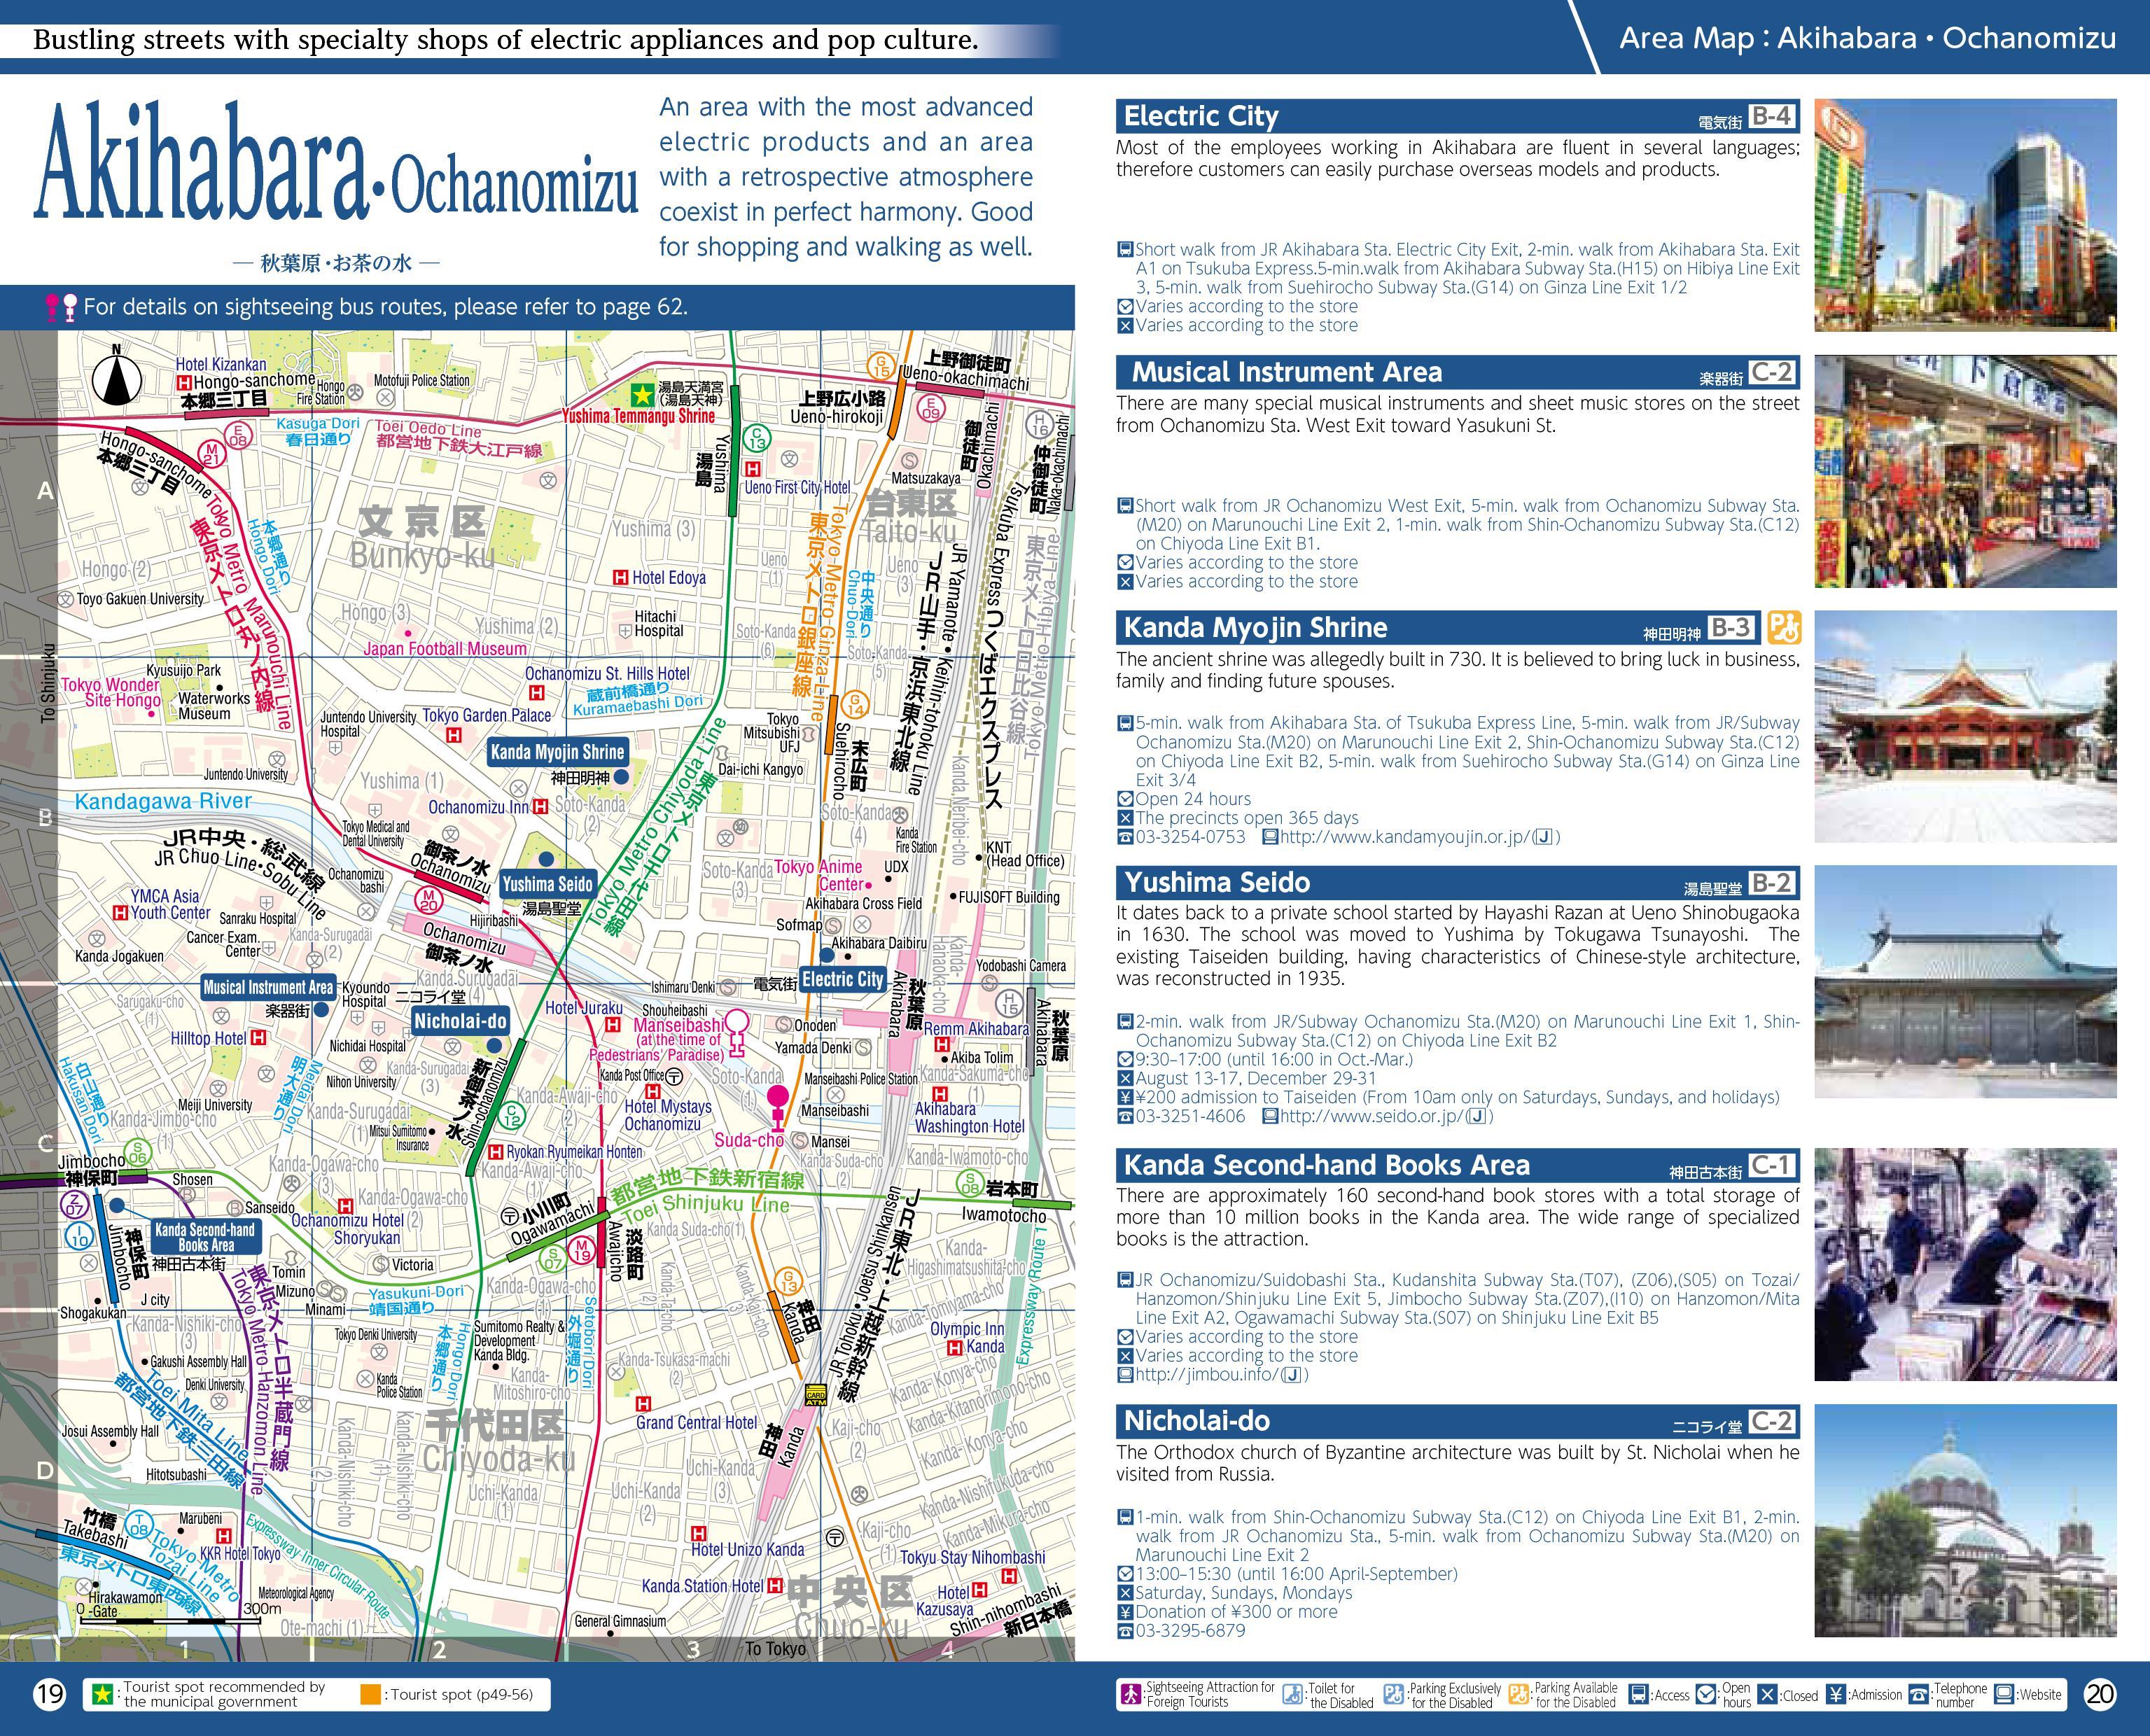 Tokyo Subway Map With Attractions.Akihabara Ochanomizu Map